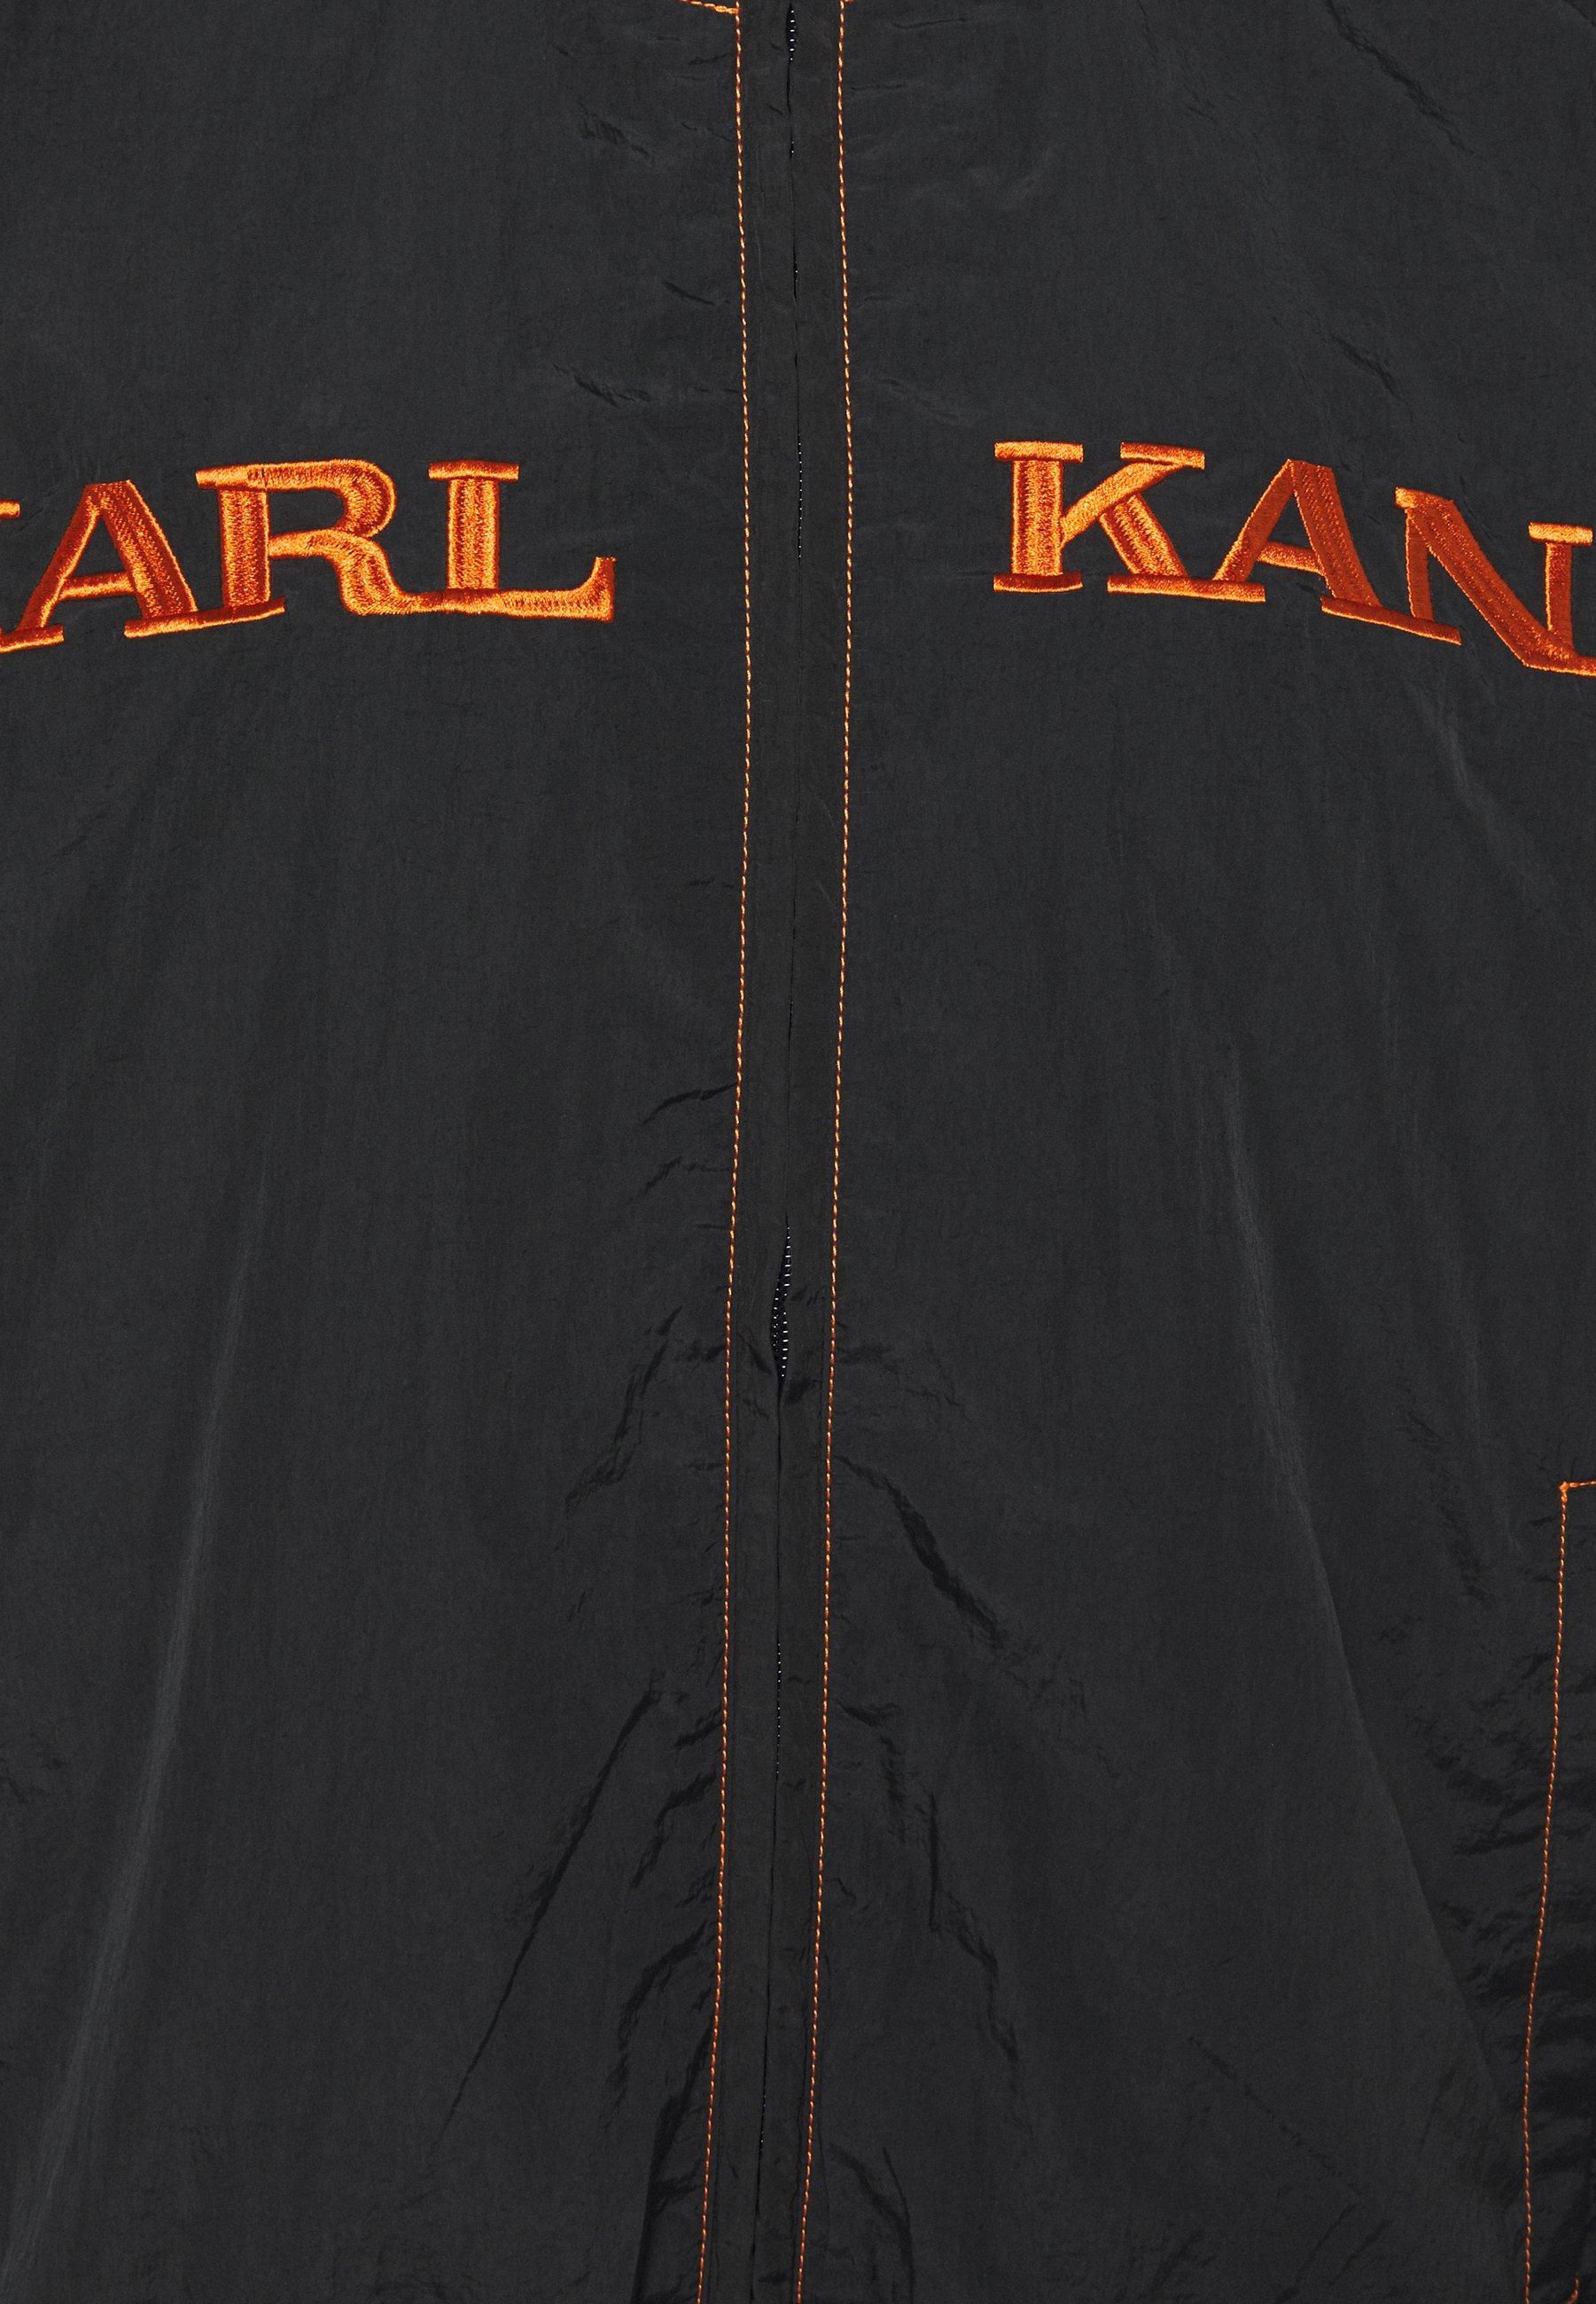 Karl Kani RETRO TRACKJACKET  Leichte Jacke black/schwarz